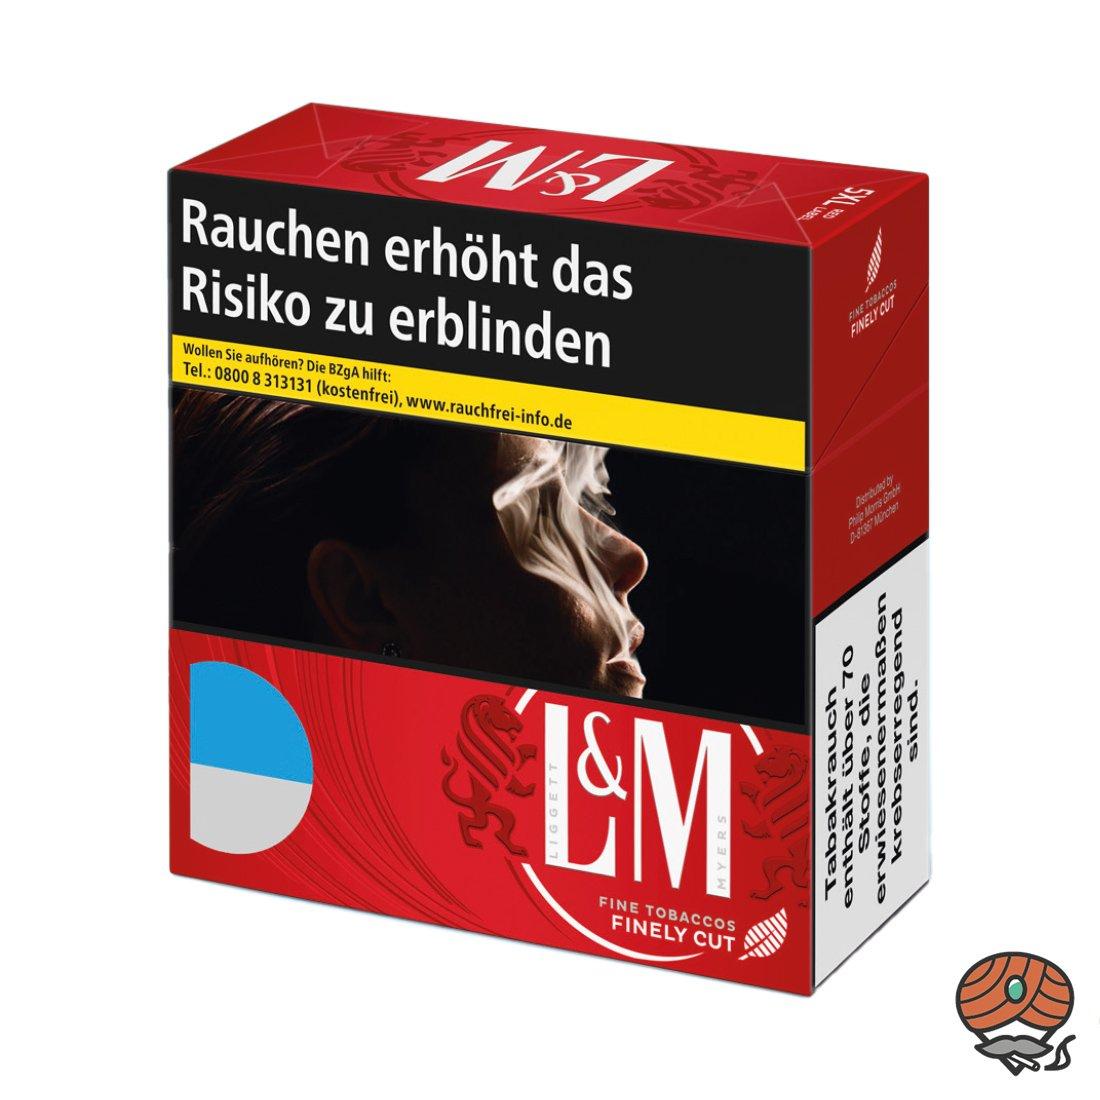 L&M Red / Rot Label 5XL Inhalt 47 Stück